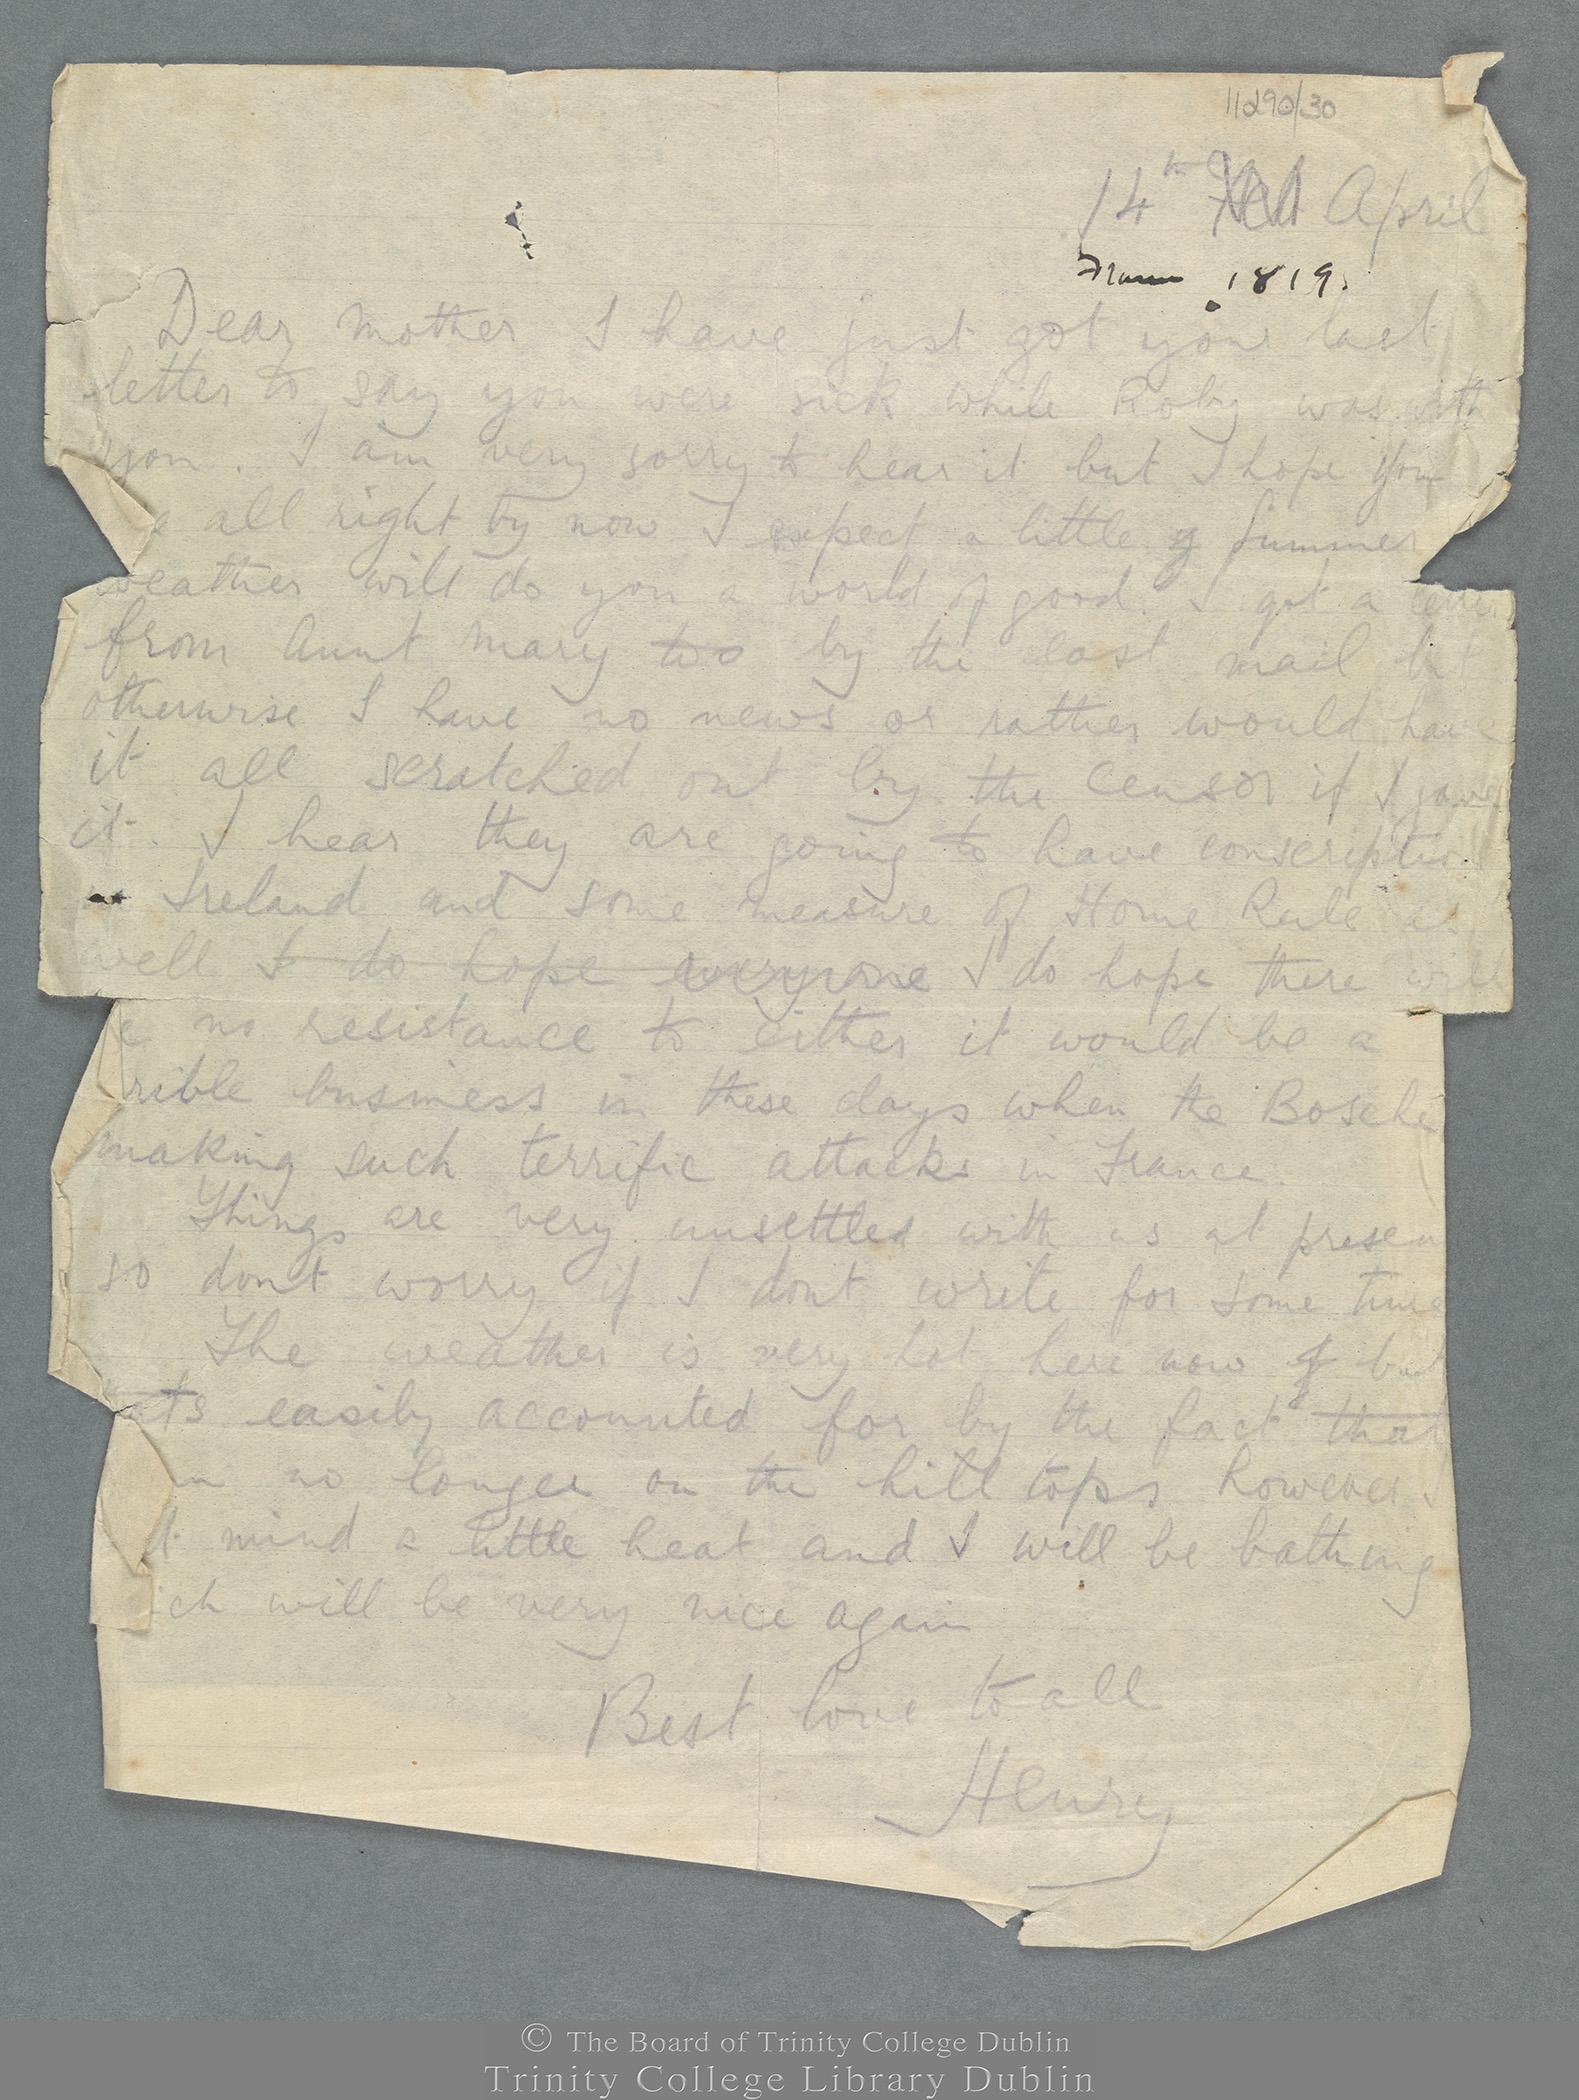 TCD MS 11290/30 folio 1 recto